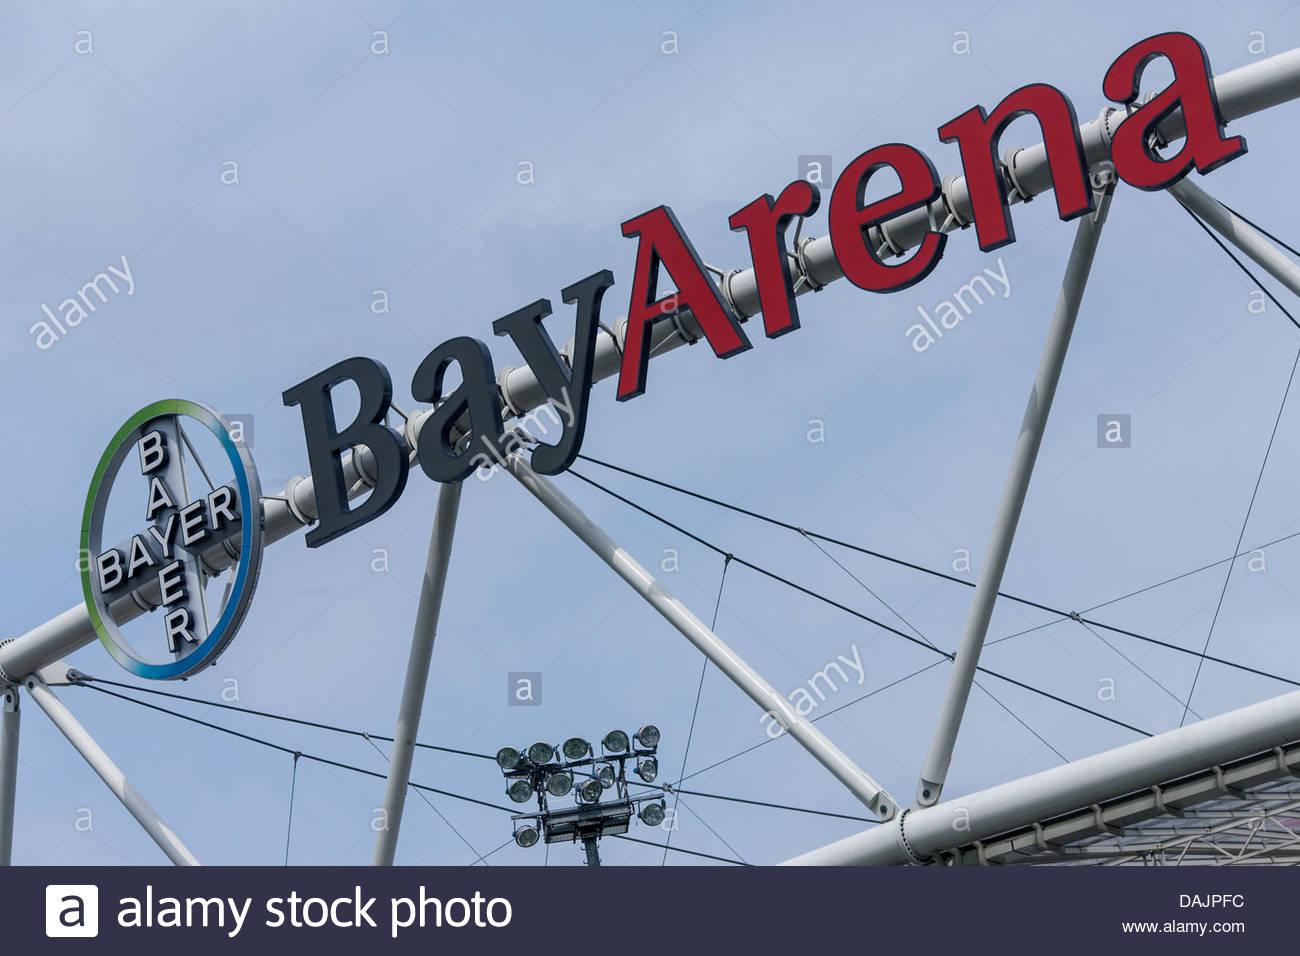 BayArena logo - Stock Image